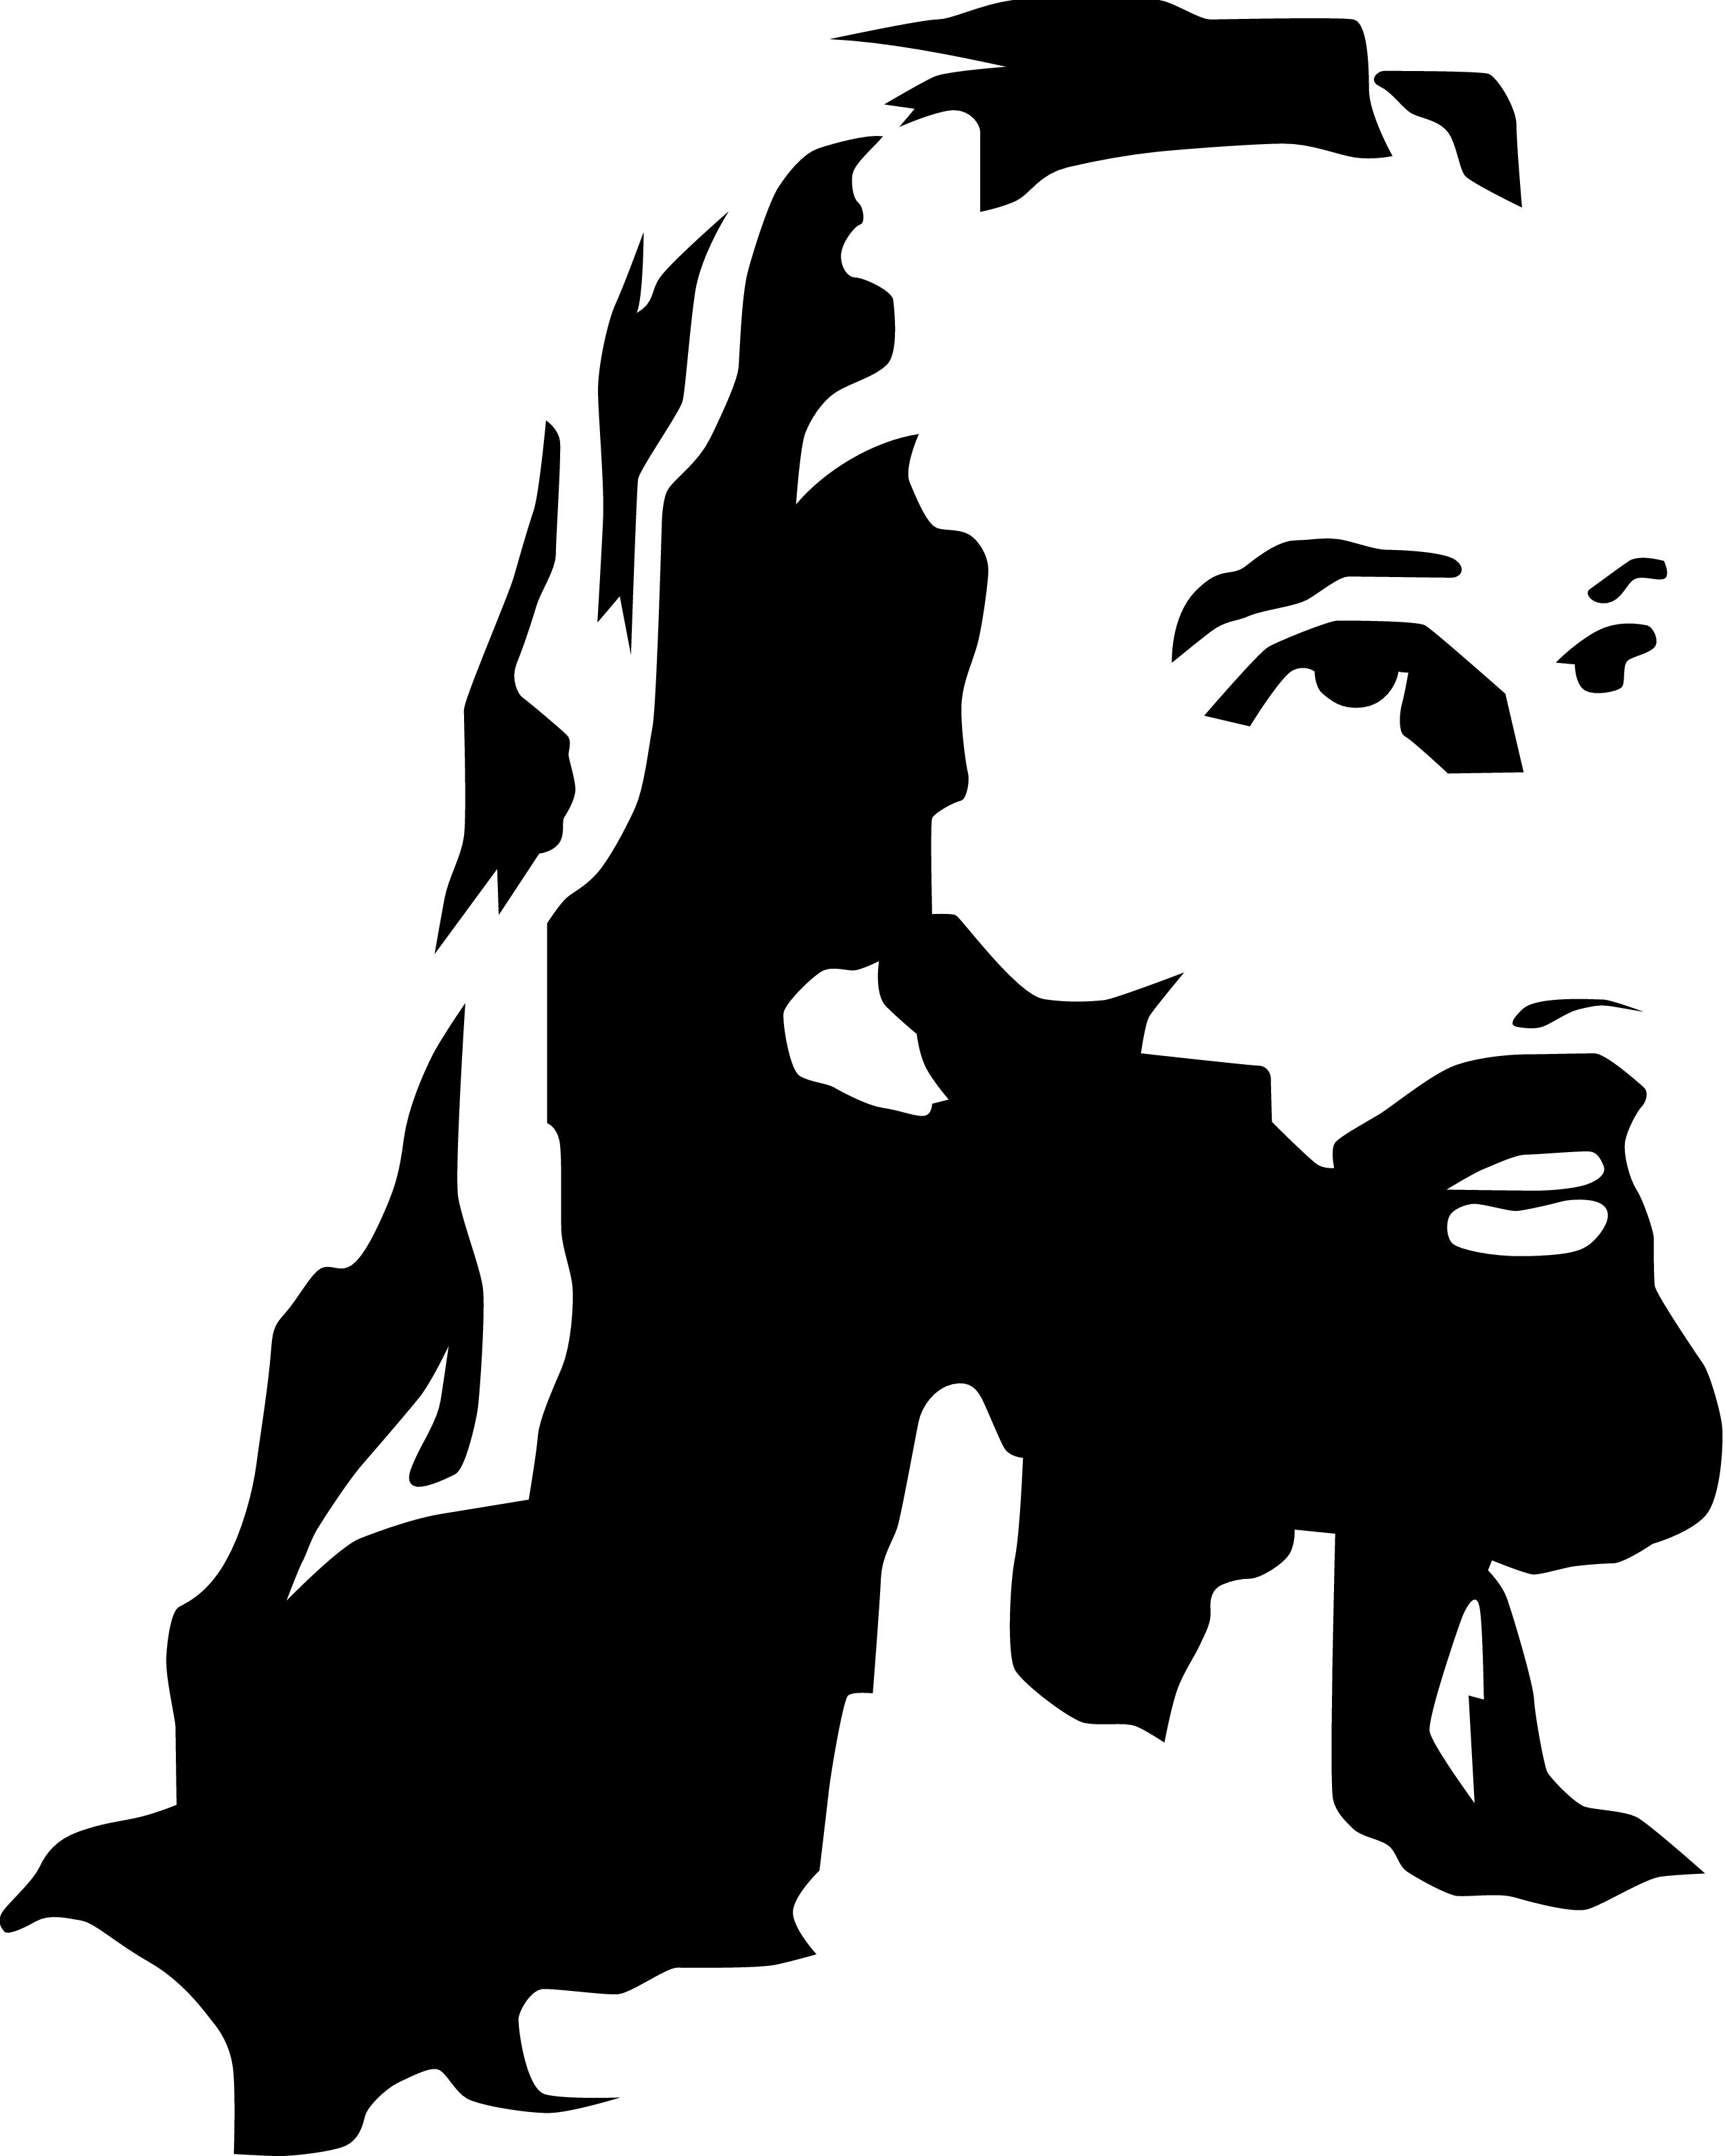 Jesus Raises Lazarus from the Dead.